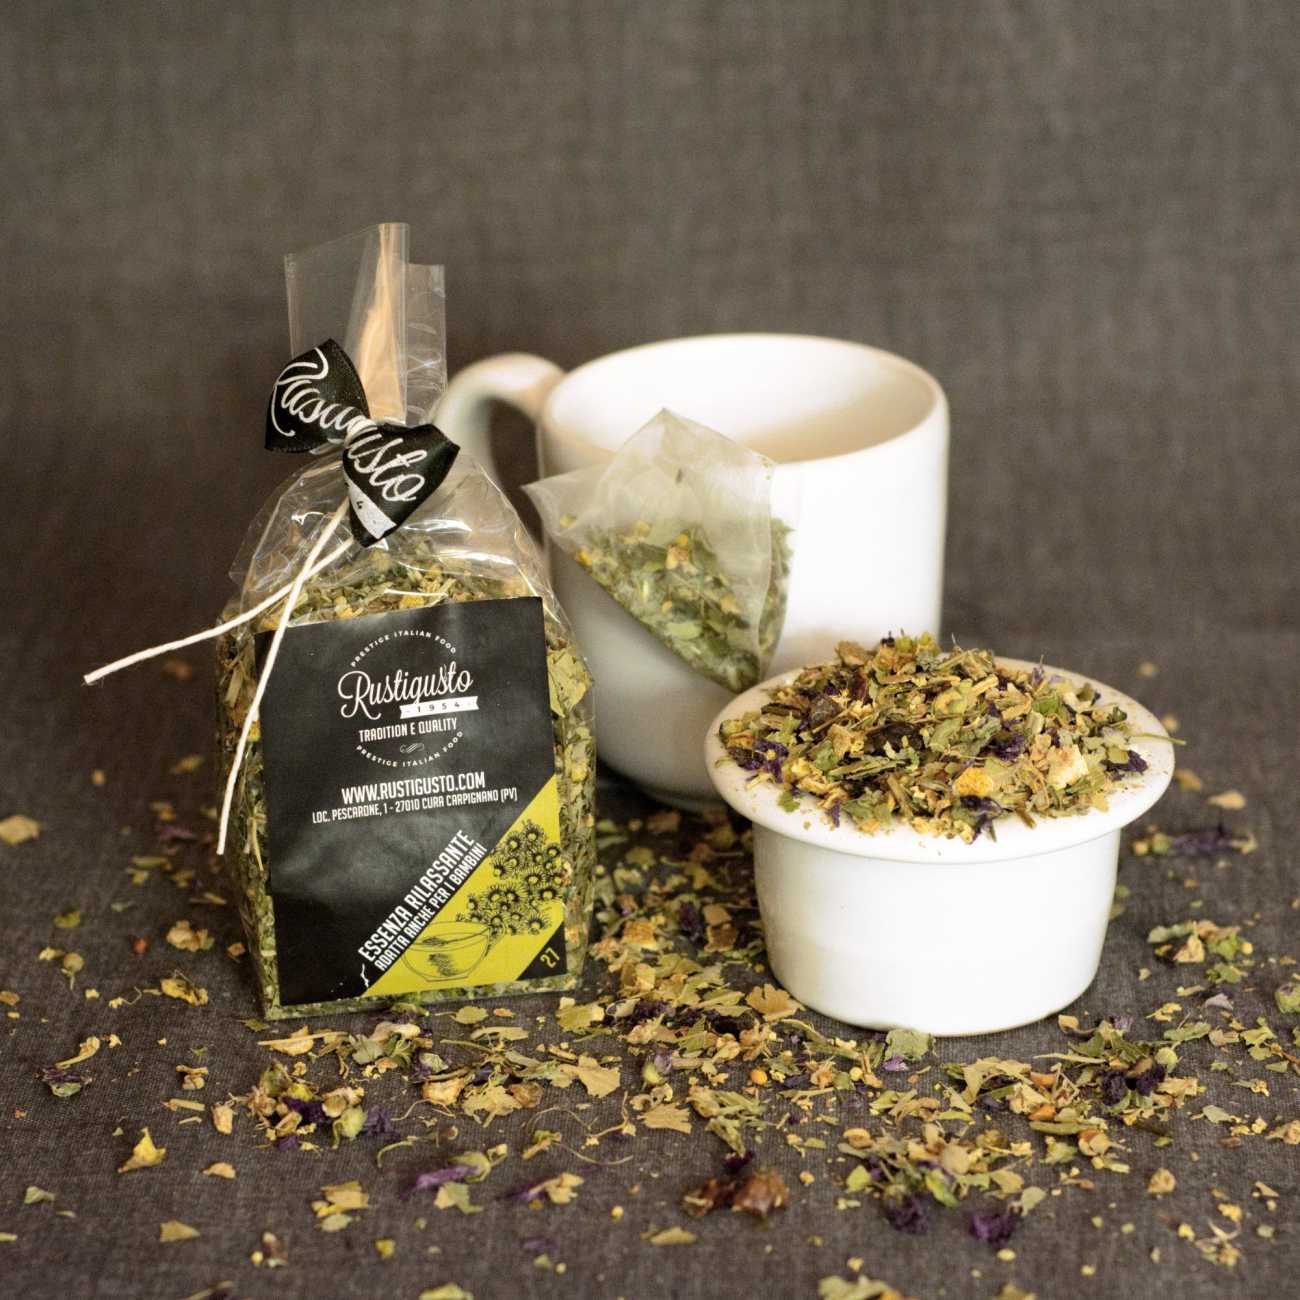 Relaxin herb tea (children) - Coffee and herbal teas